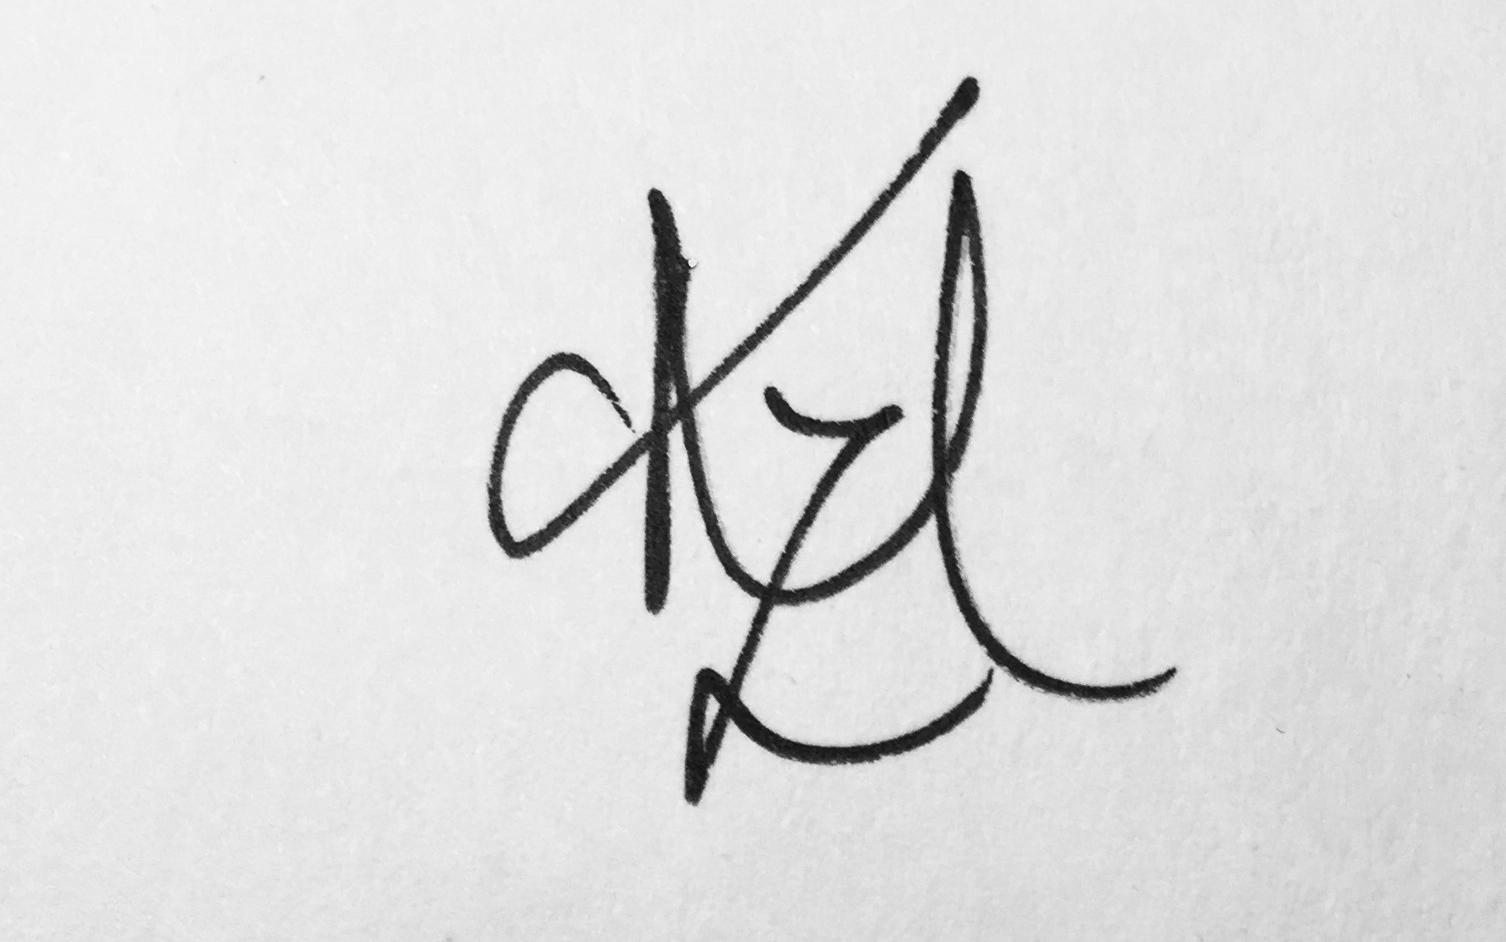 Kristin Moger's Signature